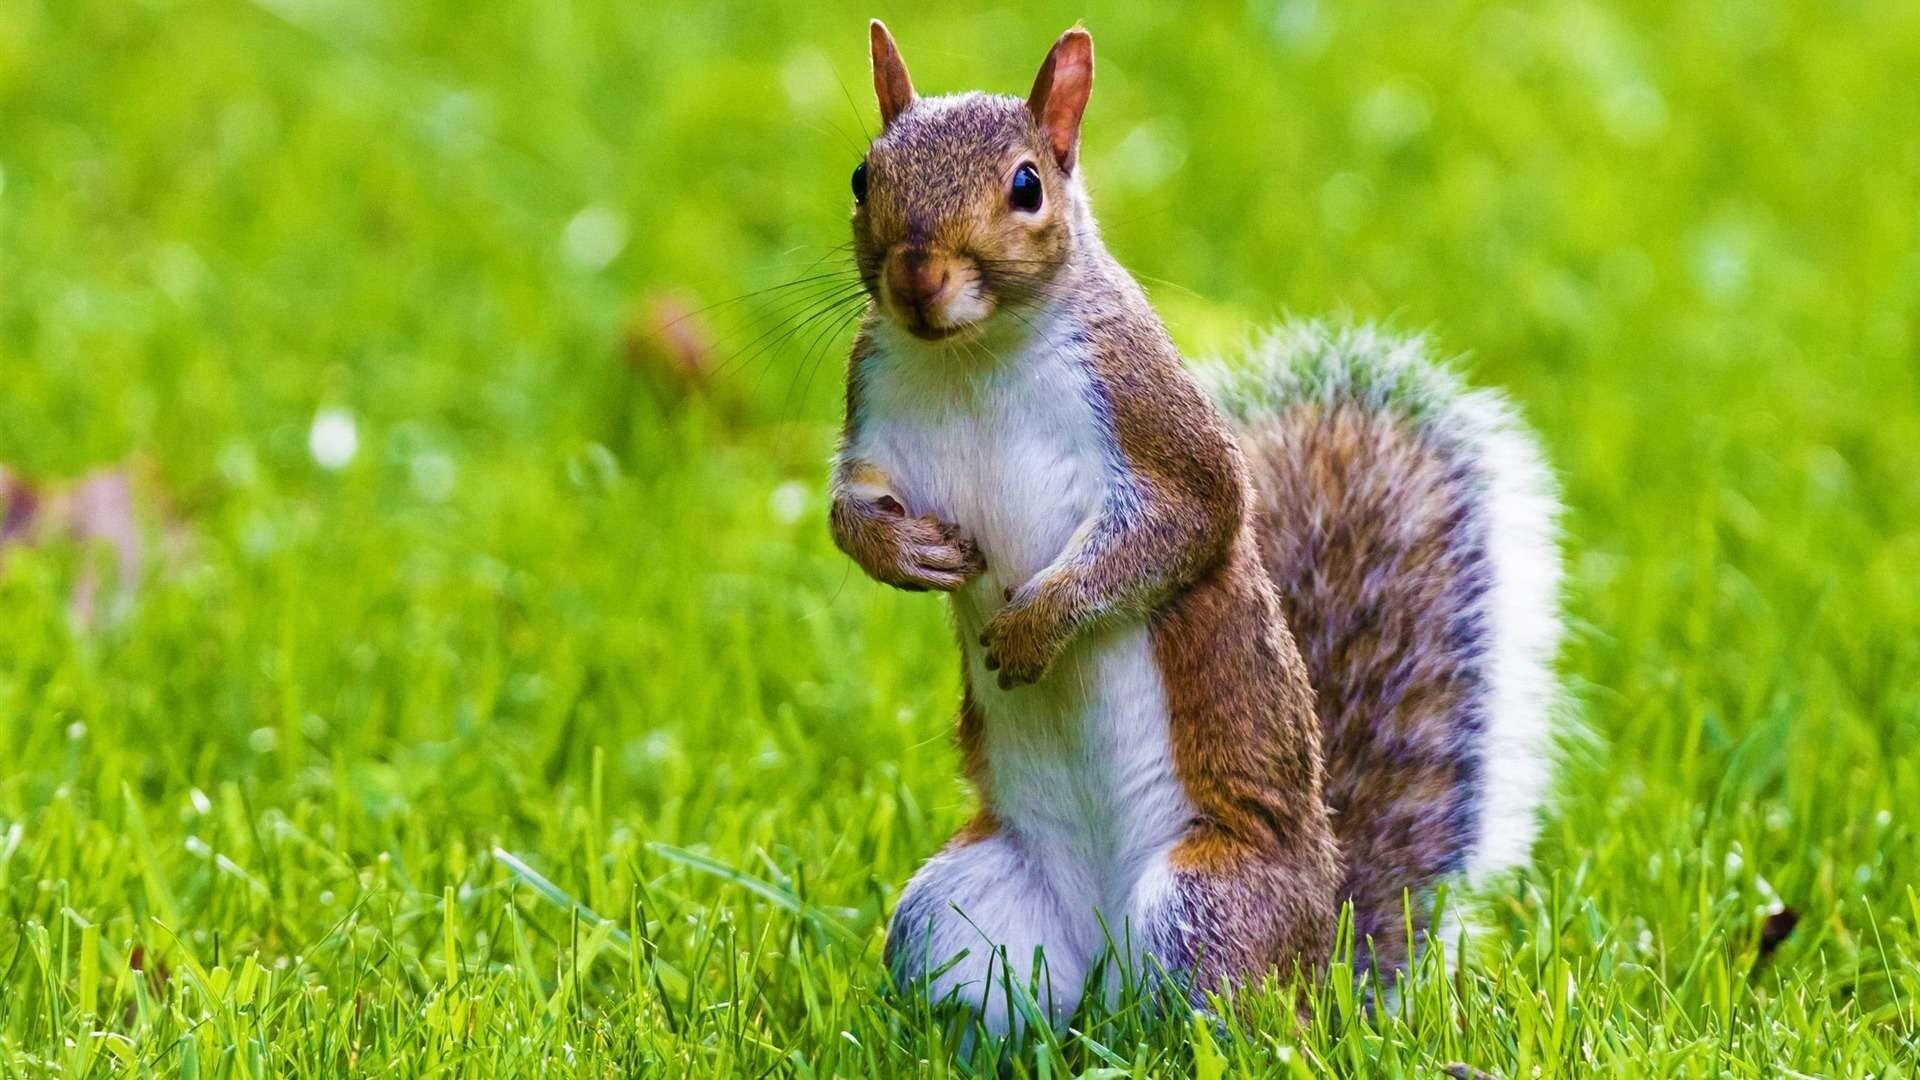 Cute-Animal-Wallpapers-For-Desktop-Background-Full –